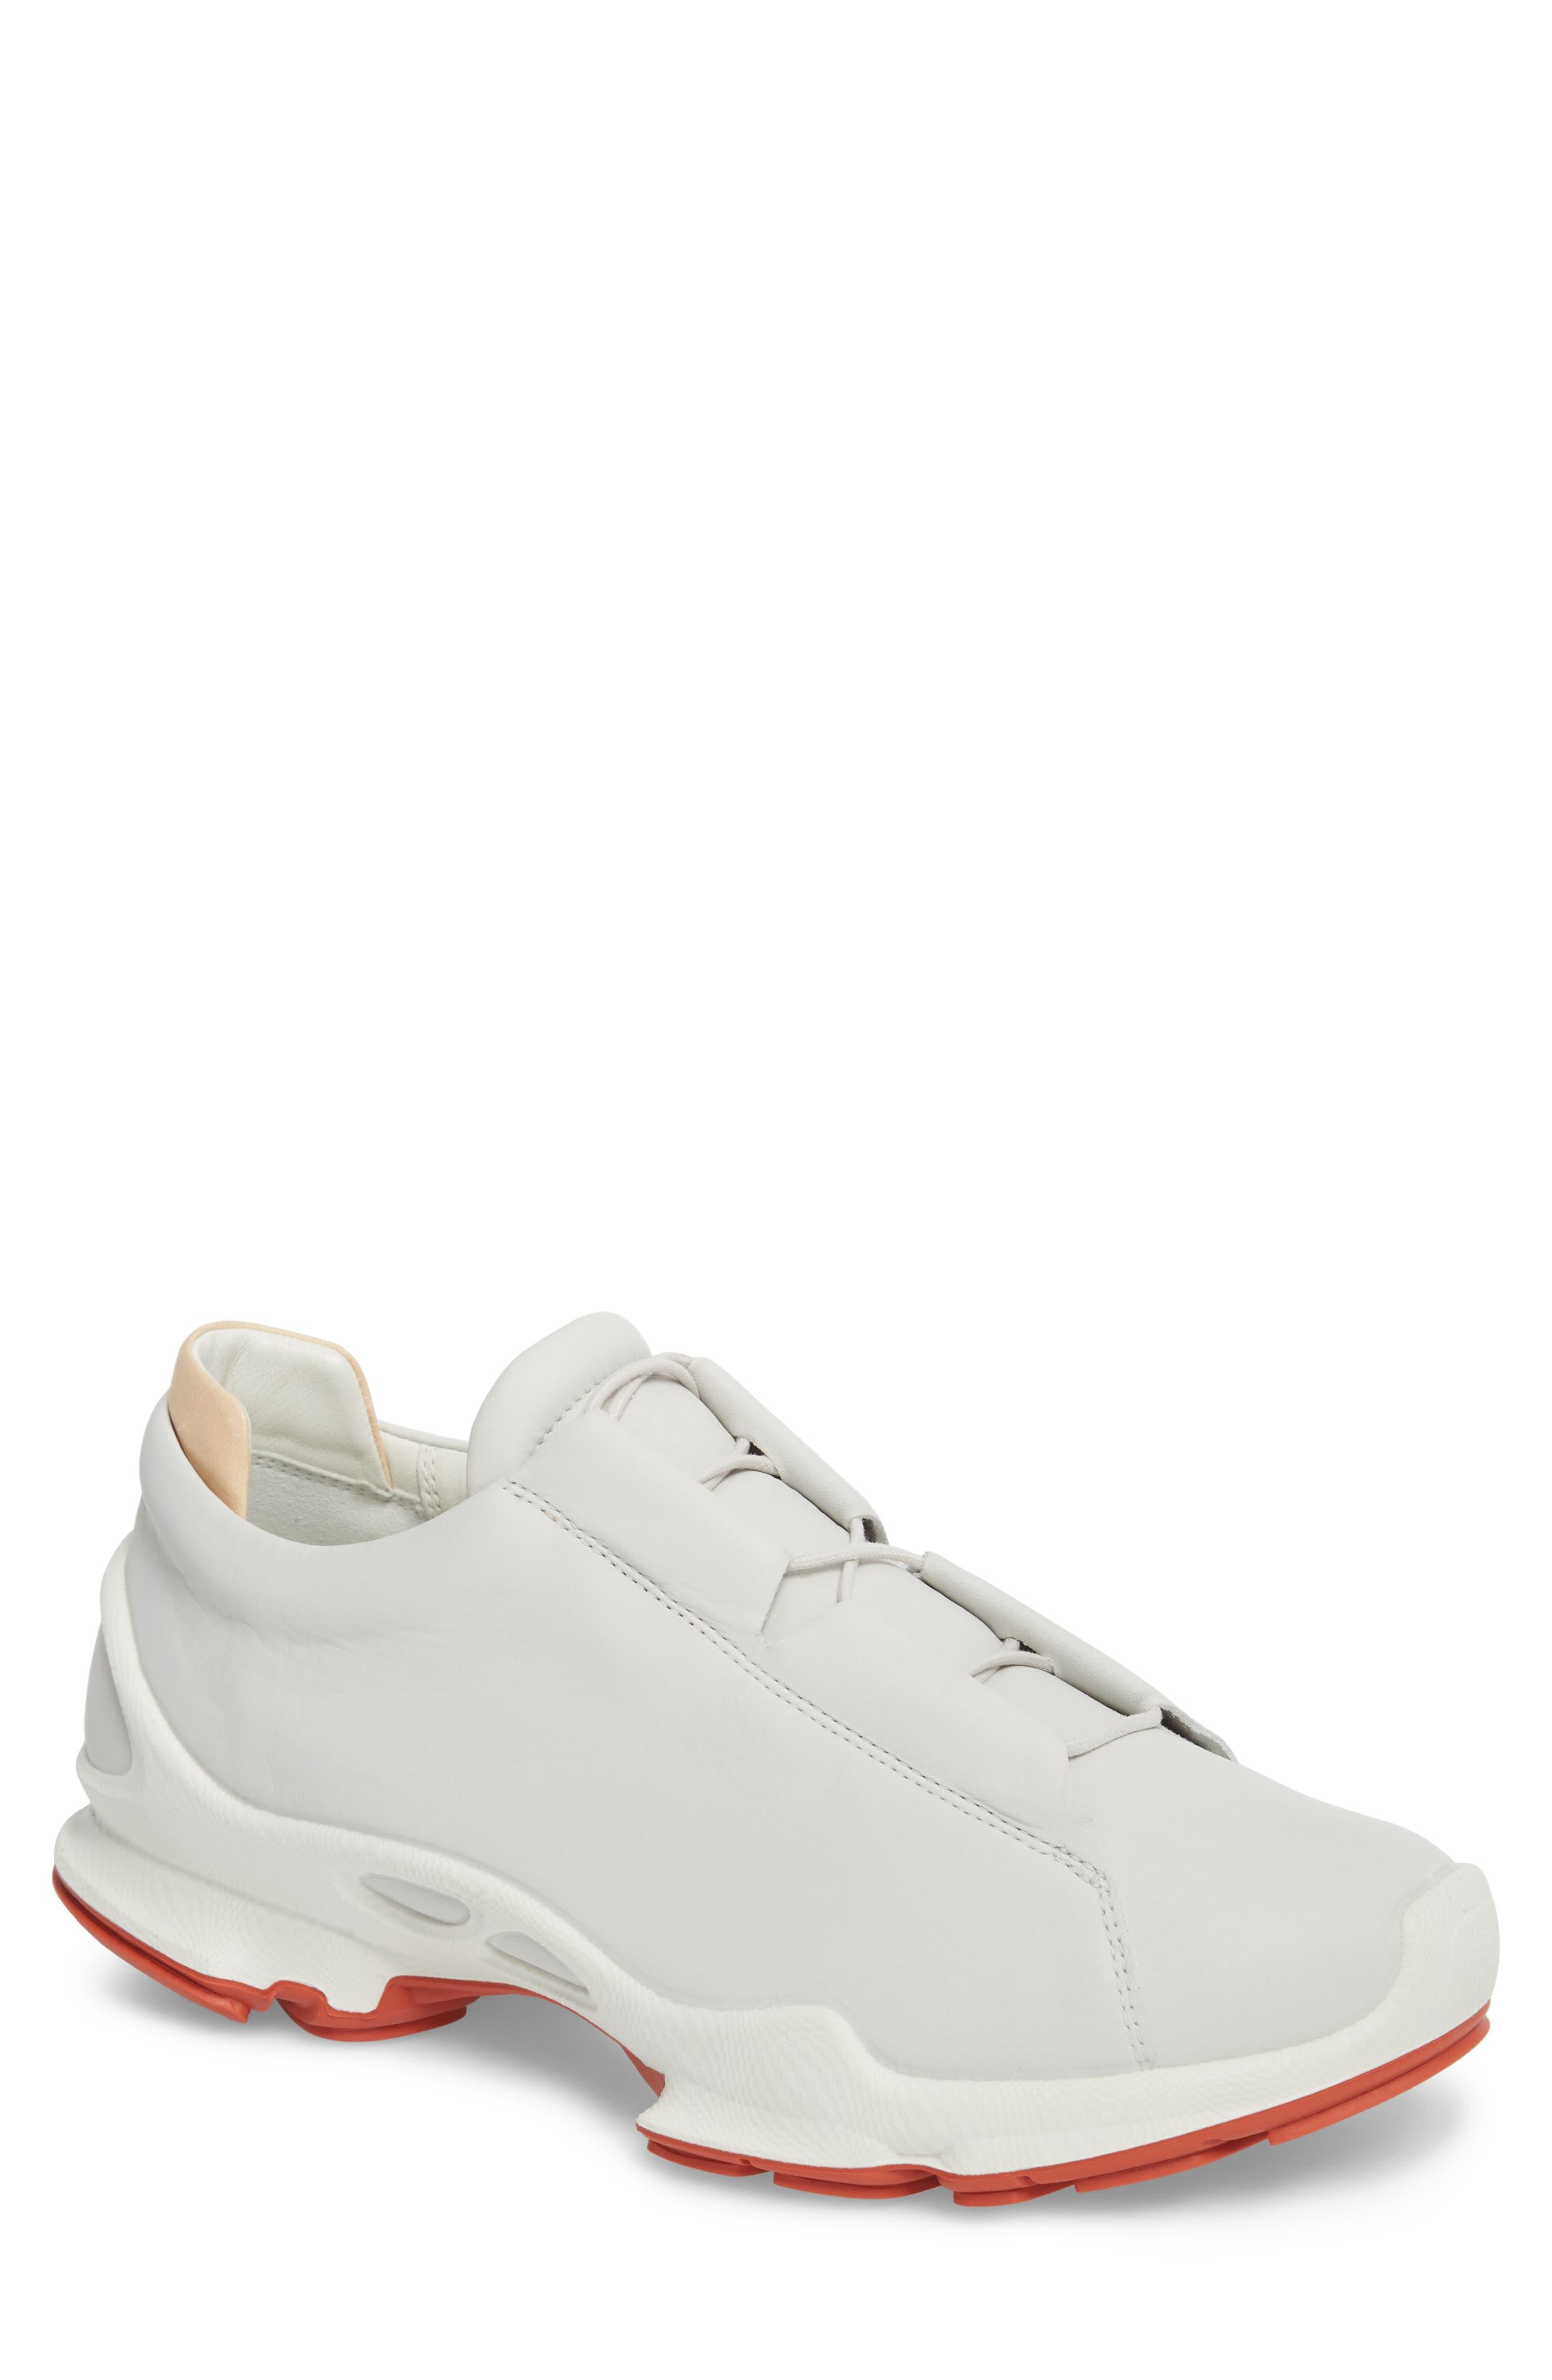 ECCO BIOM C Low Top Sneaker (Men)